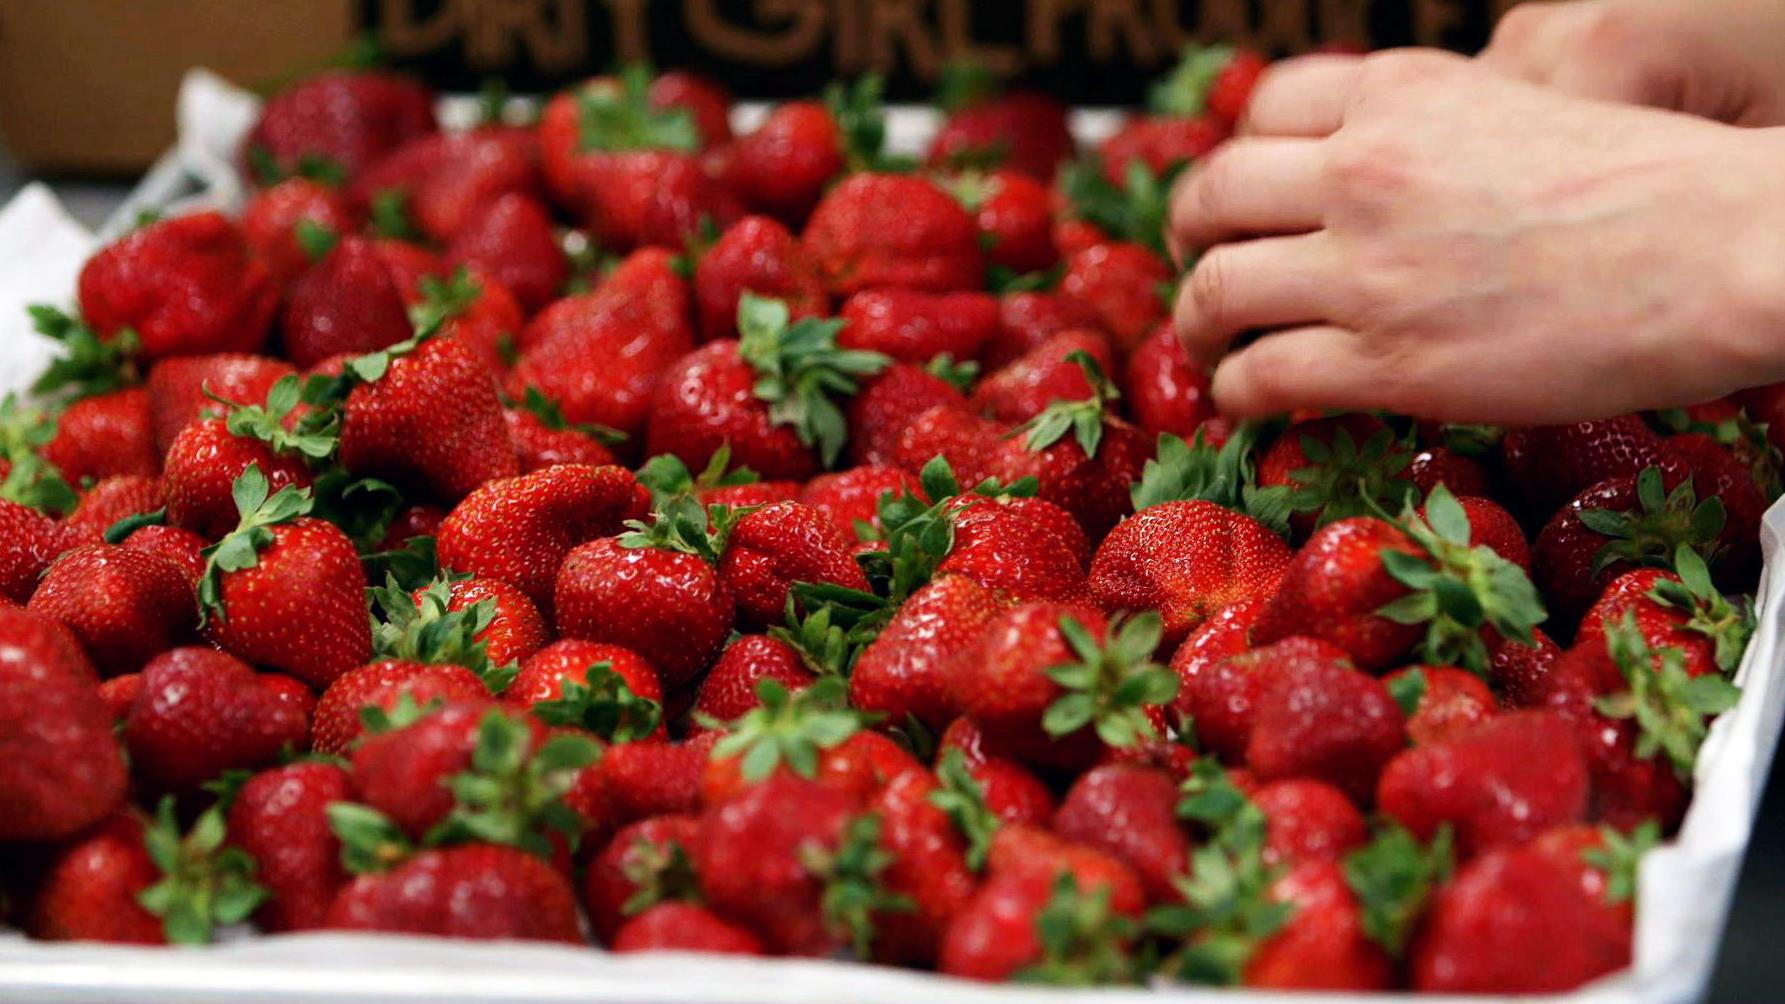 Season 4, Episode 12: Strawberry